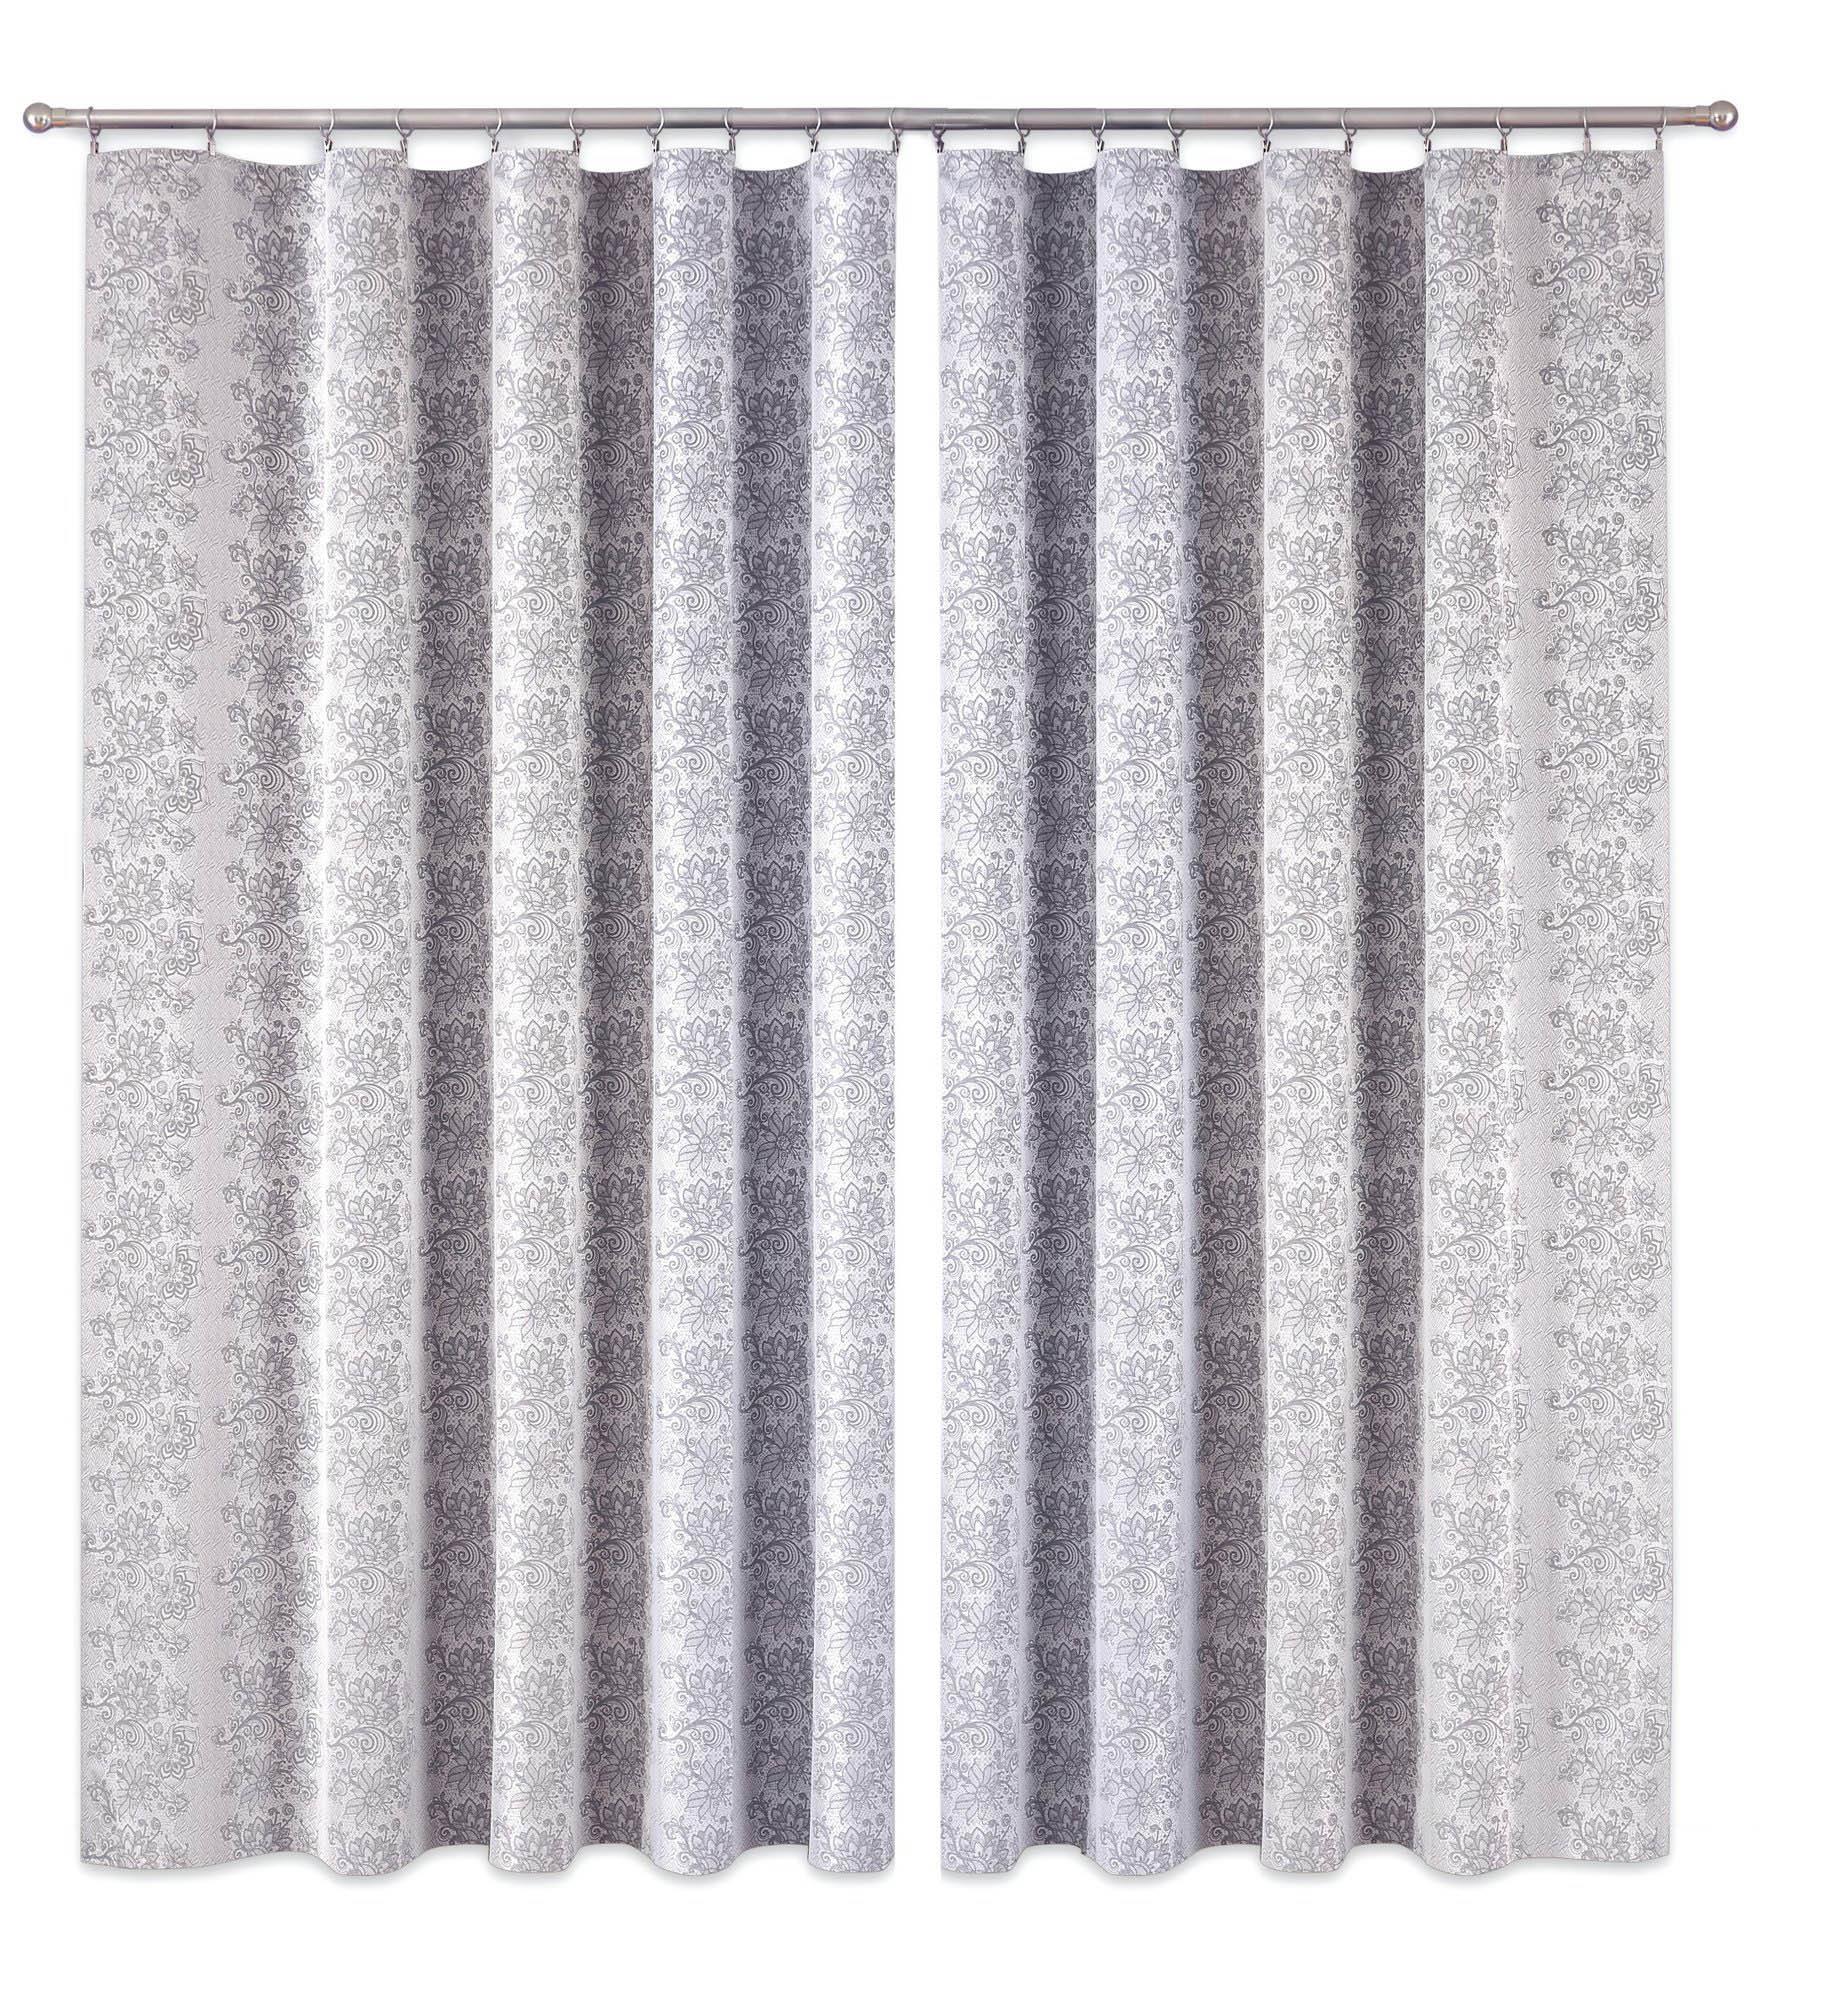 Шторы Primavera Классические шторы Natalie Цвет: Серый шторы primavera классические шторы maev цвет салатовый